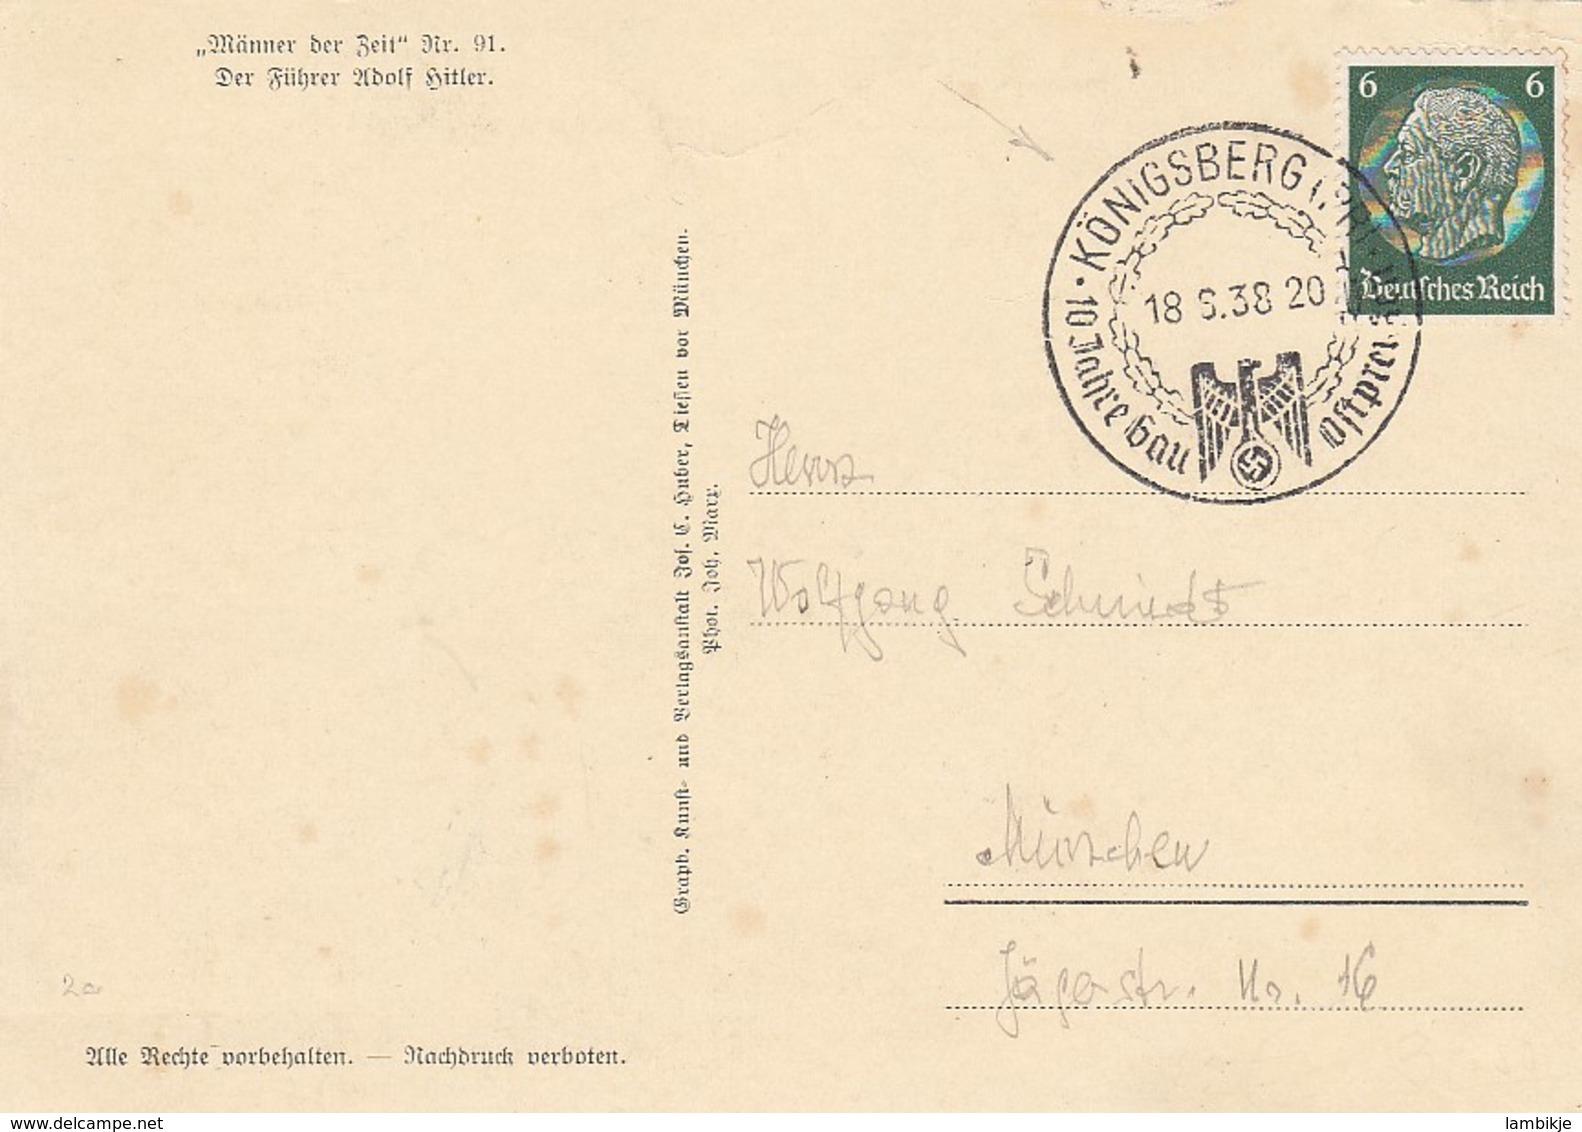 Deutsches Reich Propaganda Postkarte 1938 - Briefe U. Dokumente